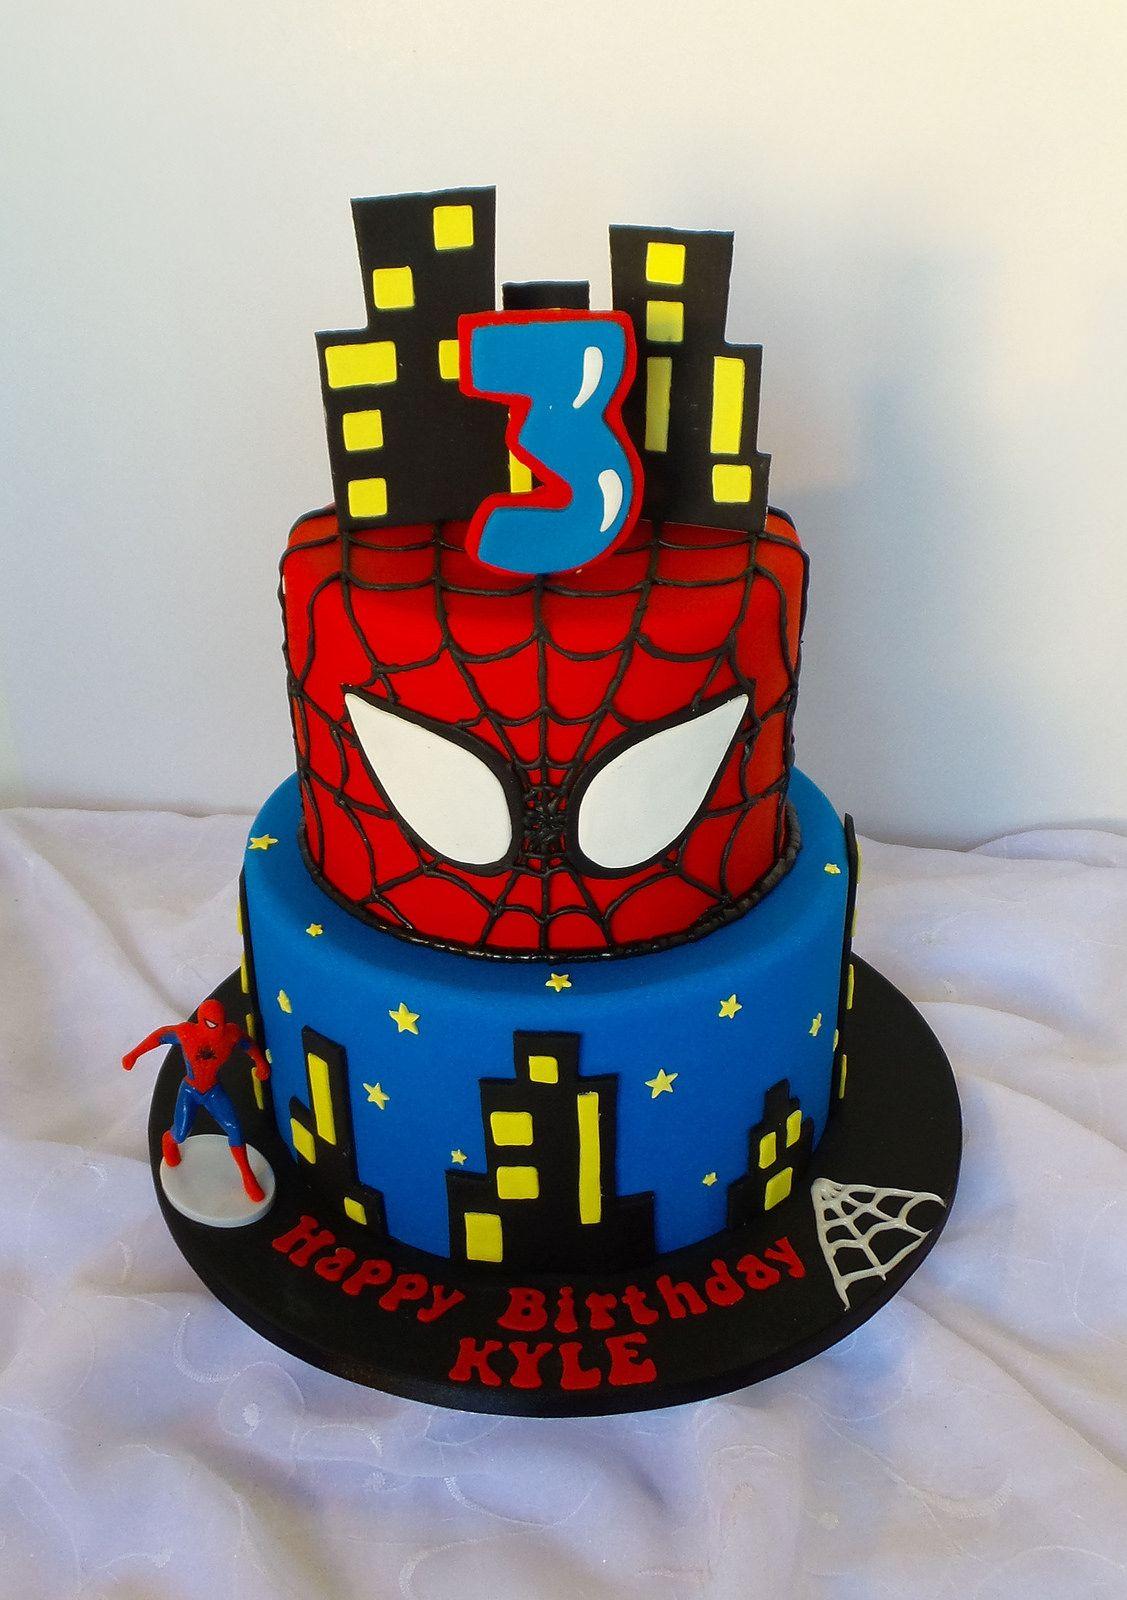 Two Tier Spiderman Themed Birthday Cake Celebrations Pinterest